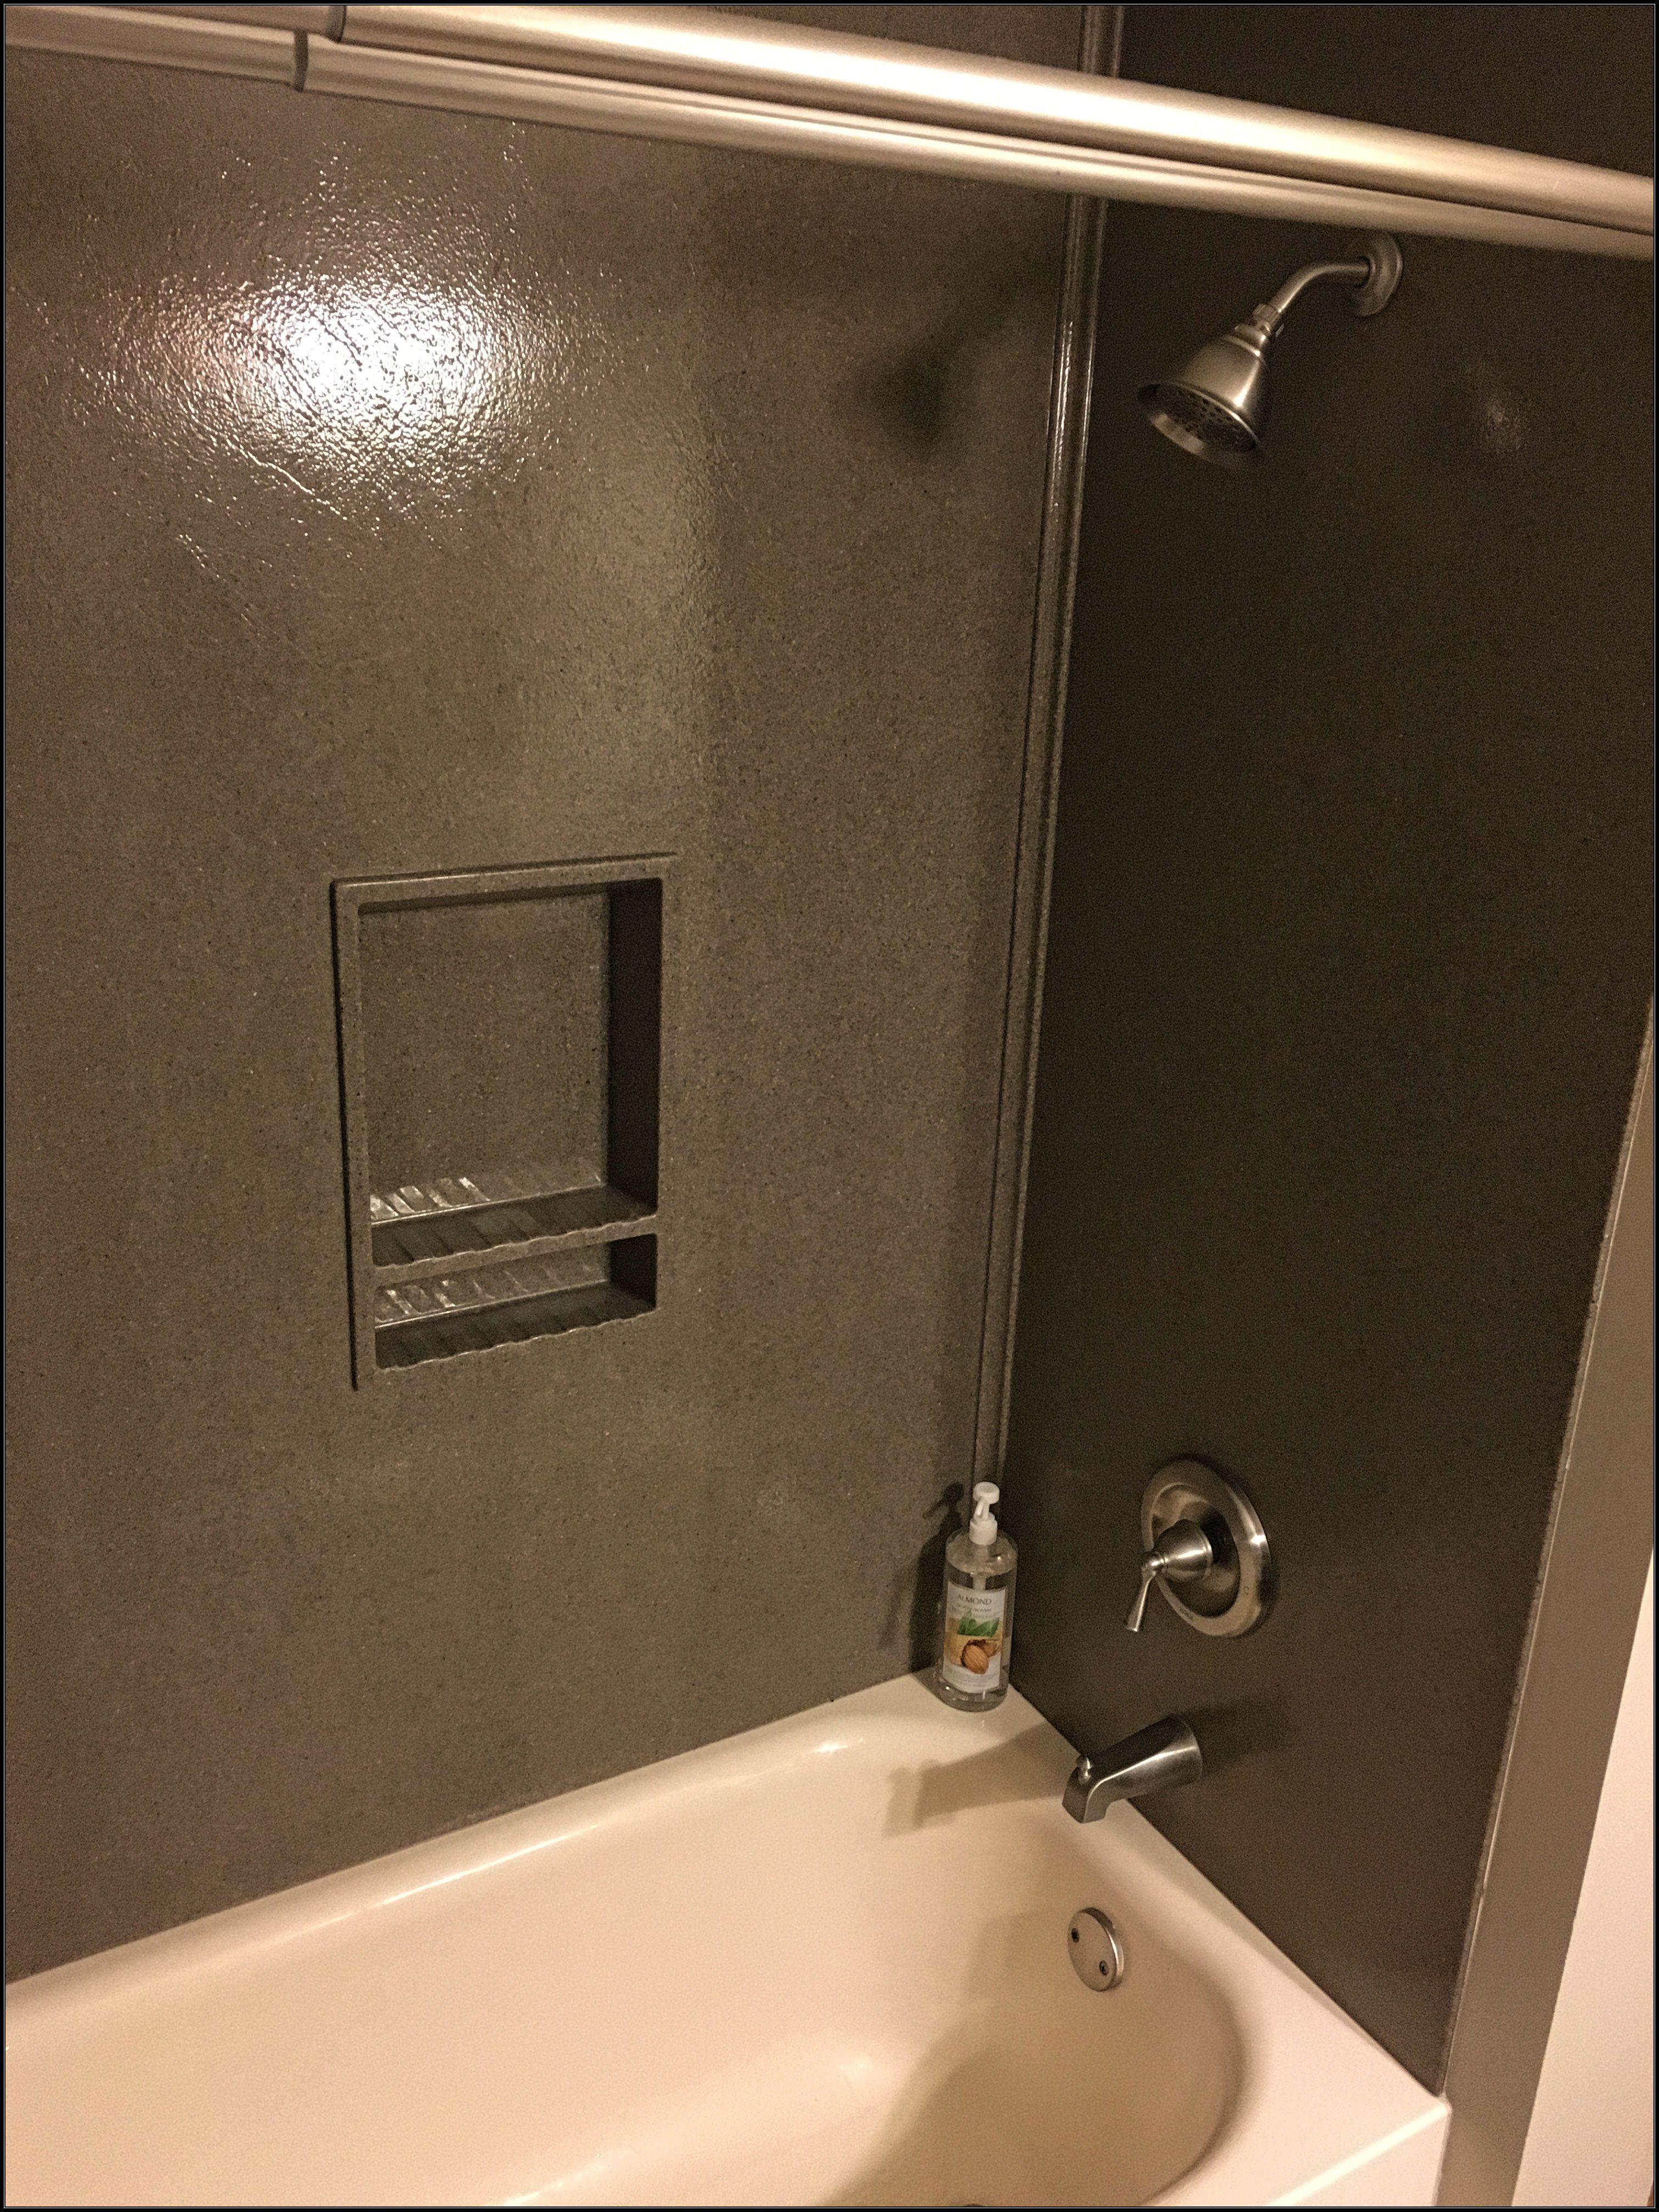 Onyx colelction bath walls bathroom remodeling vanvleet - Onyx shower reviews ...